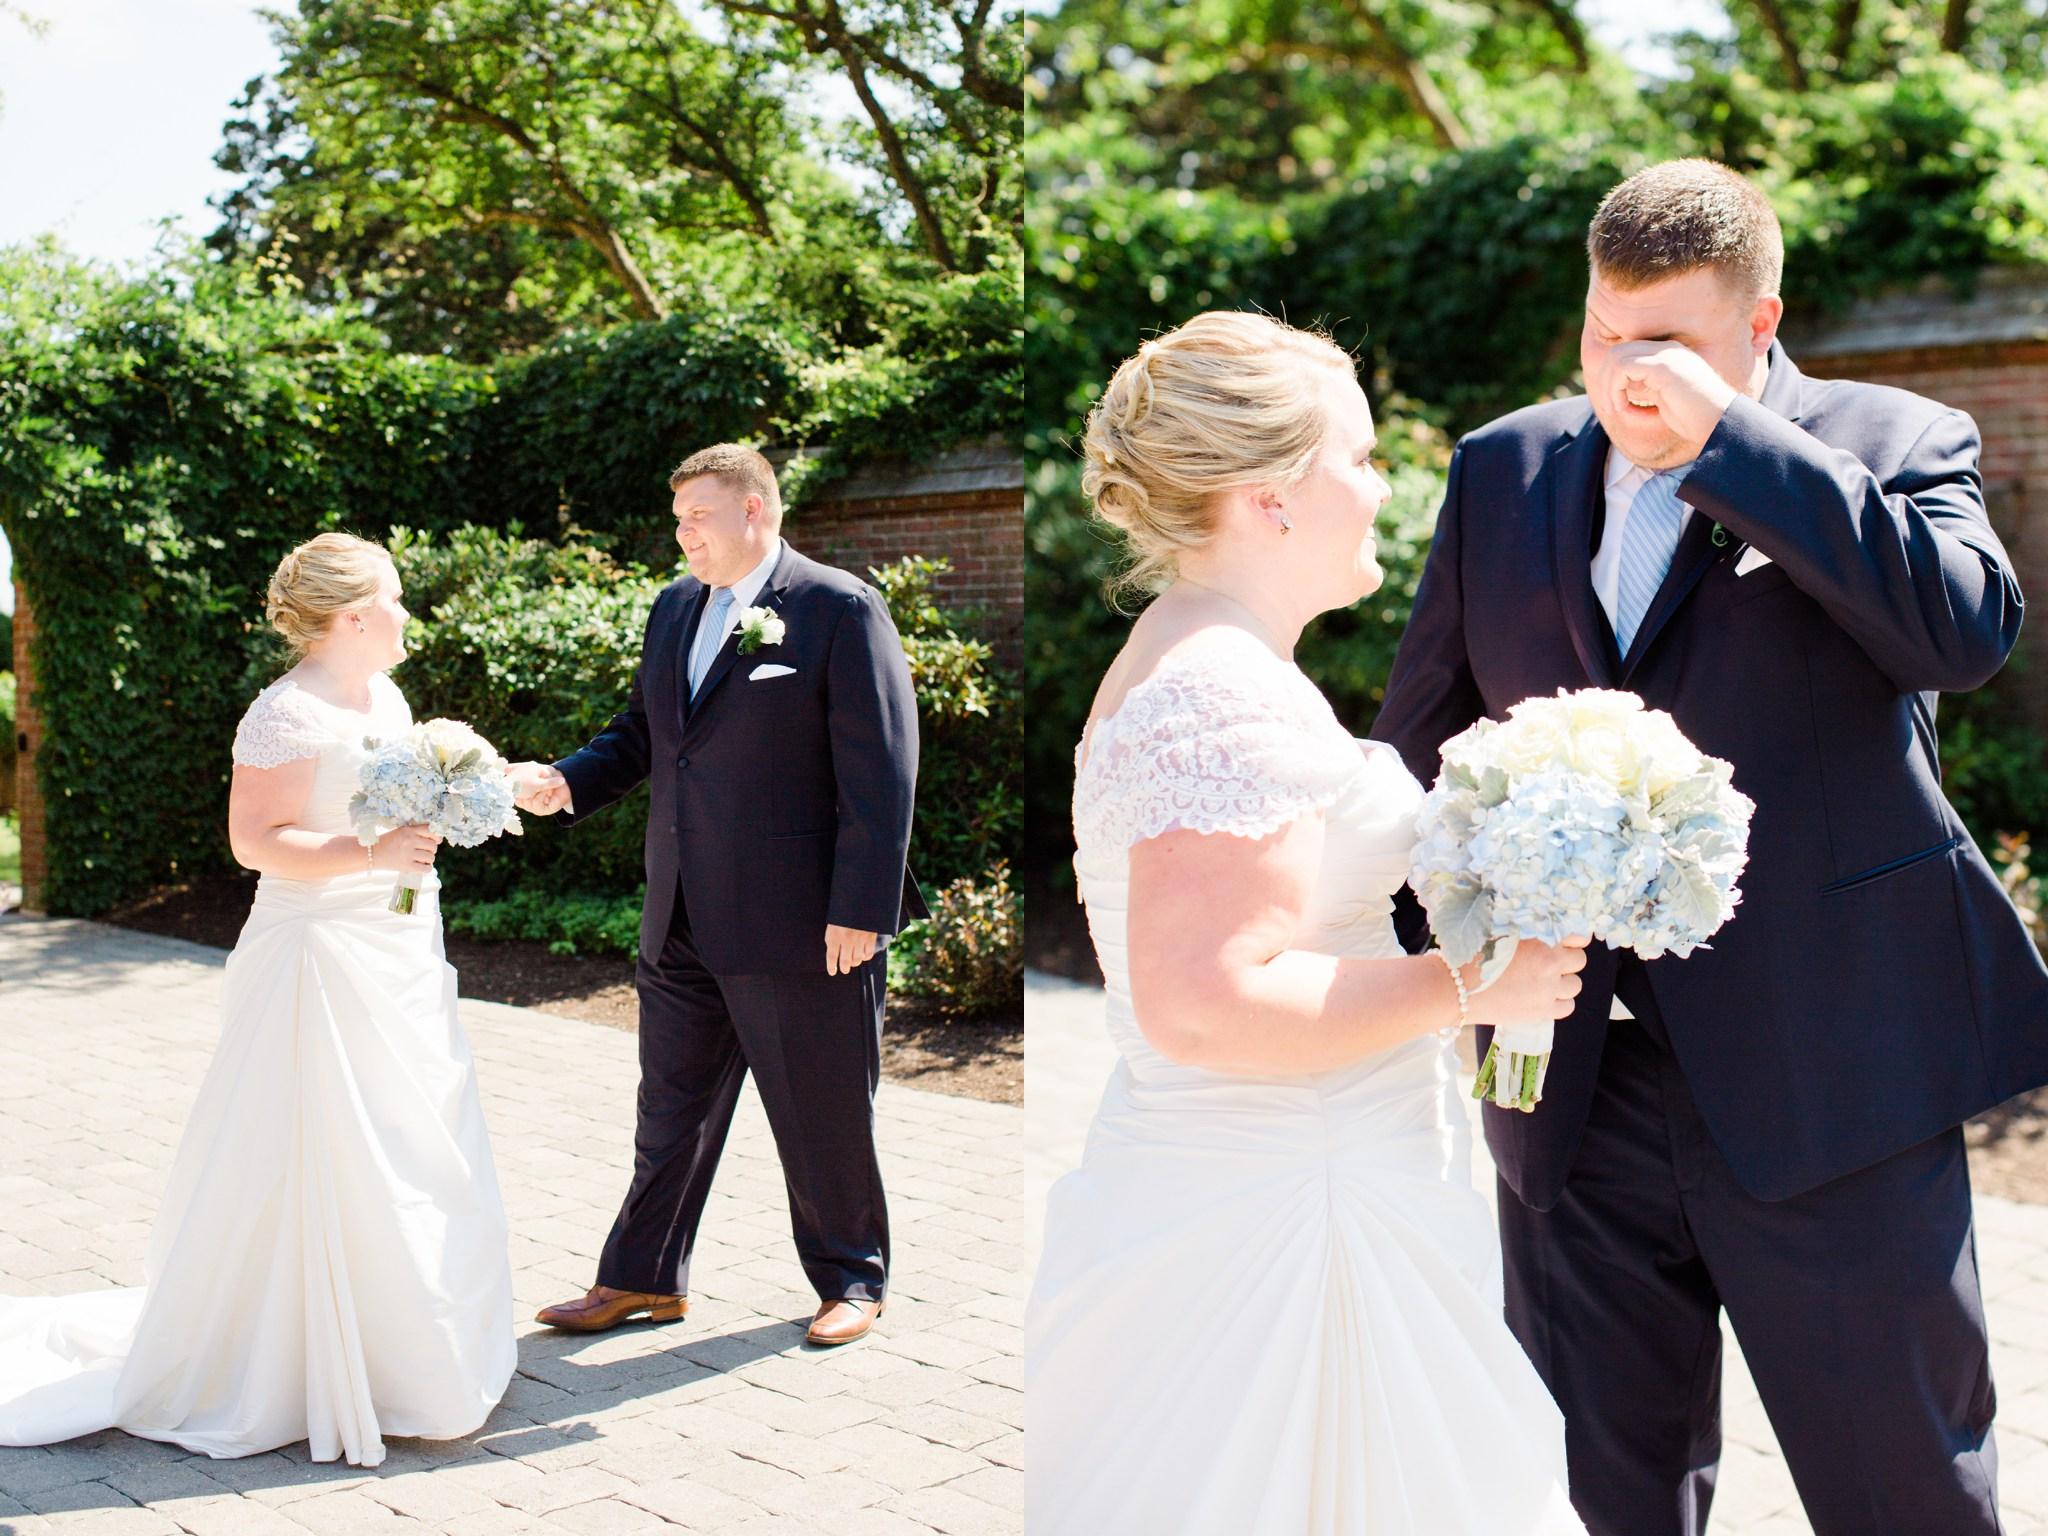 misselwood_endicott_college_wedding_photos_00024.JPG